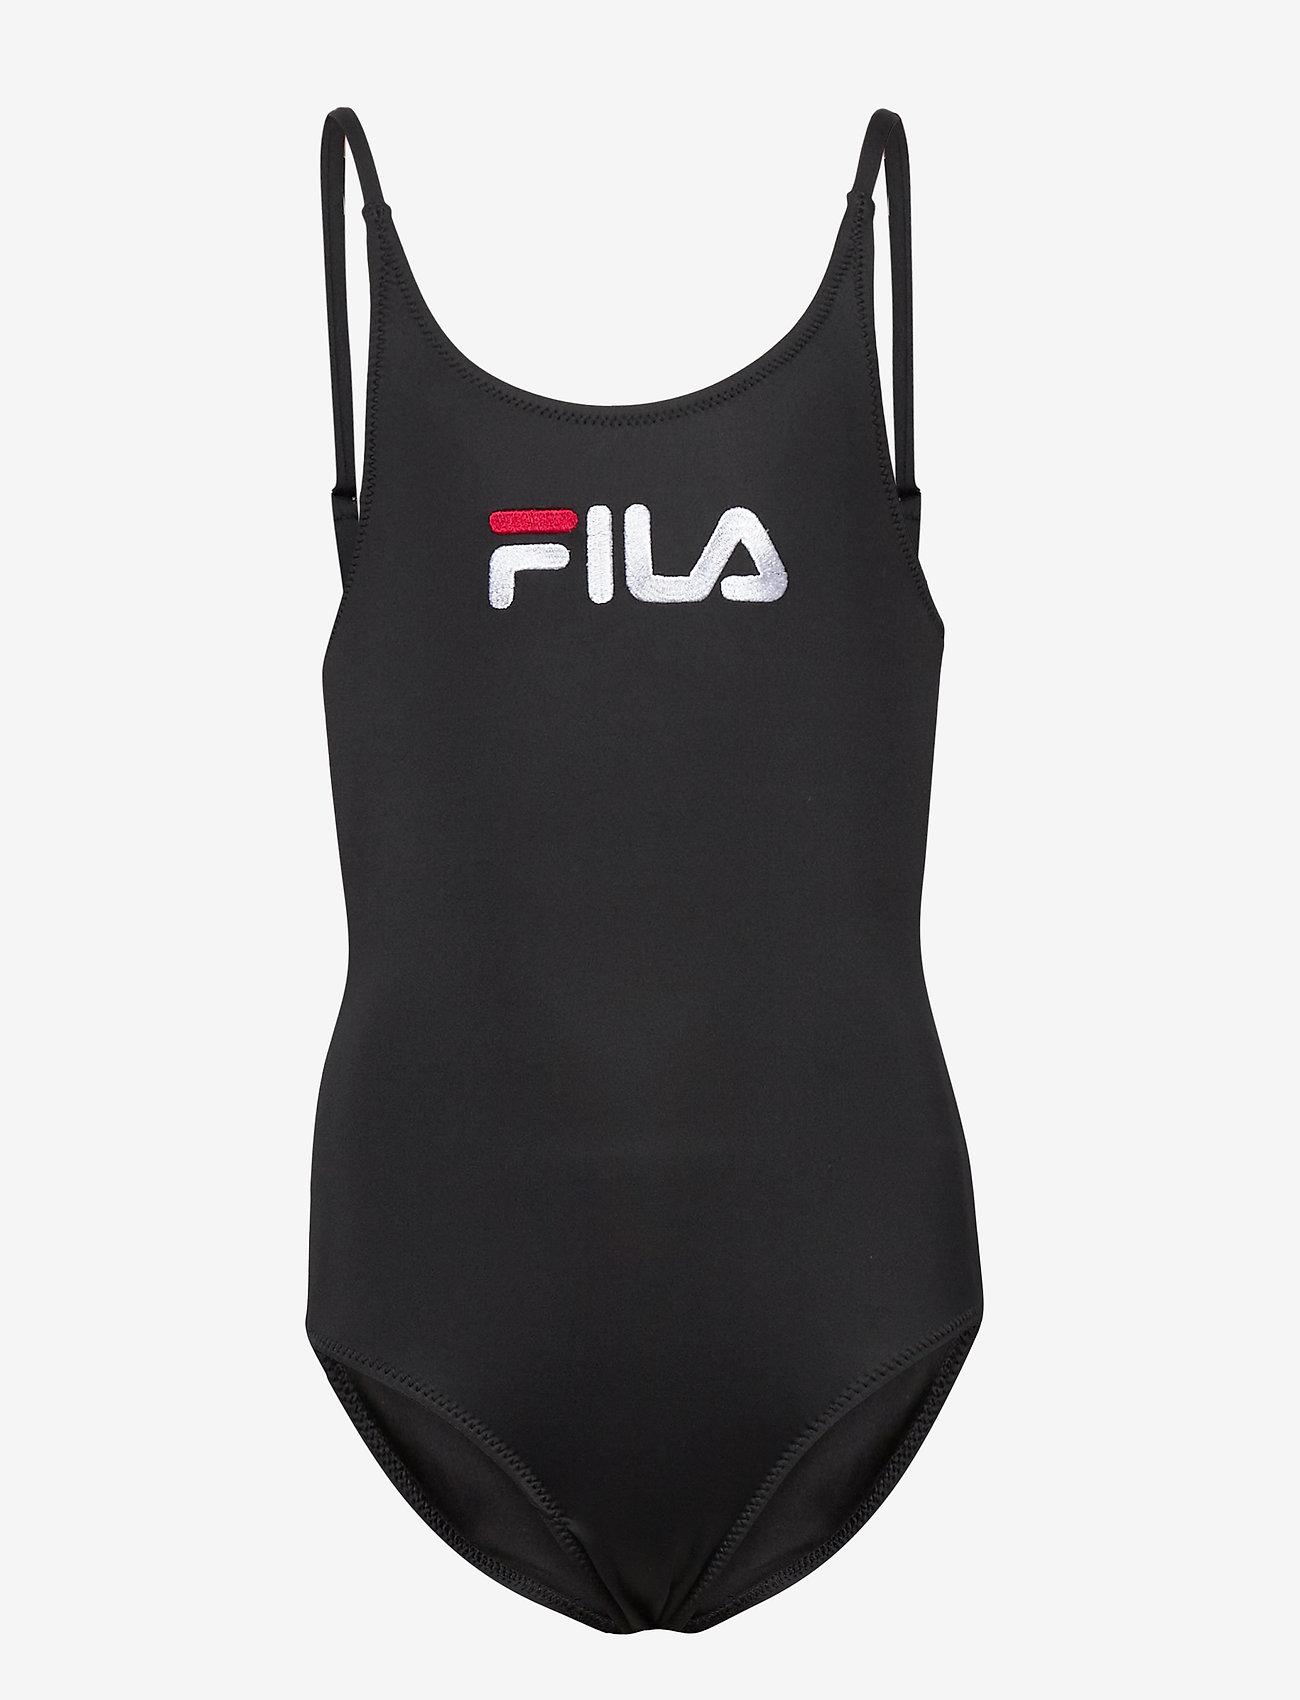 FILA - TEENS GIRLS CAROL swim suit - swimsuits - black - 0